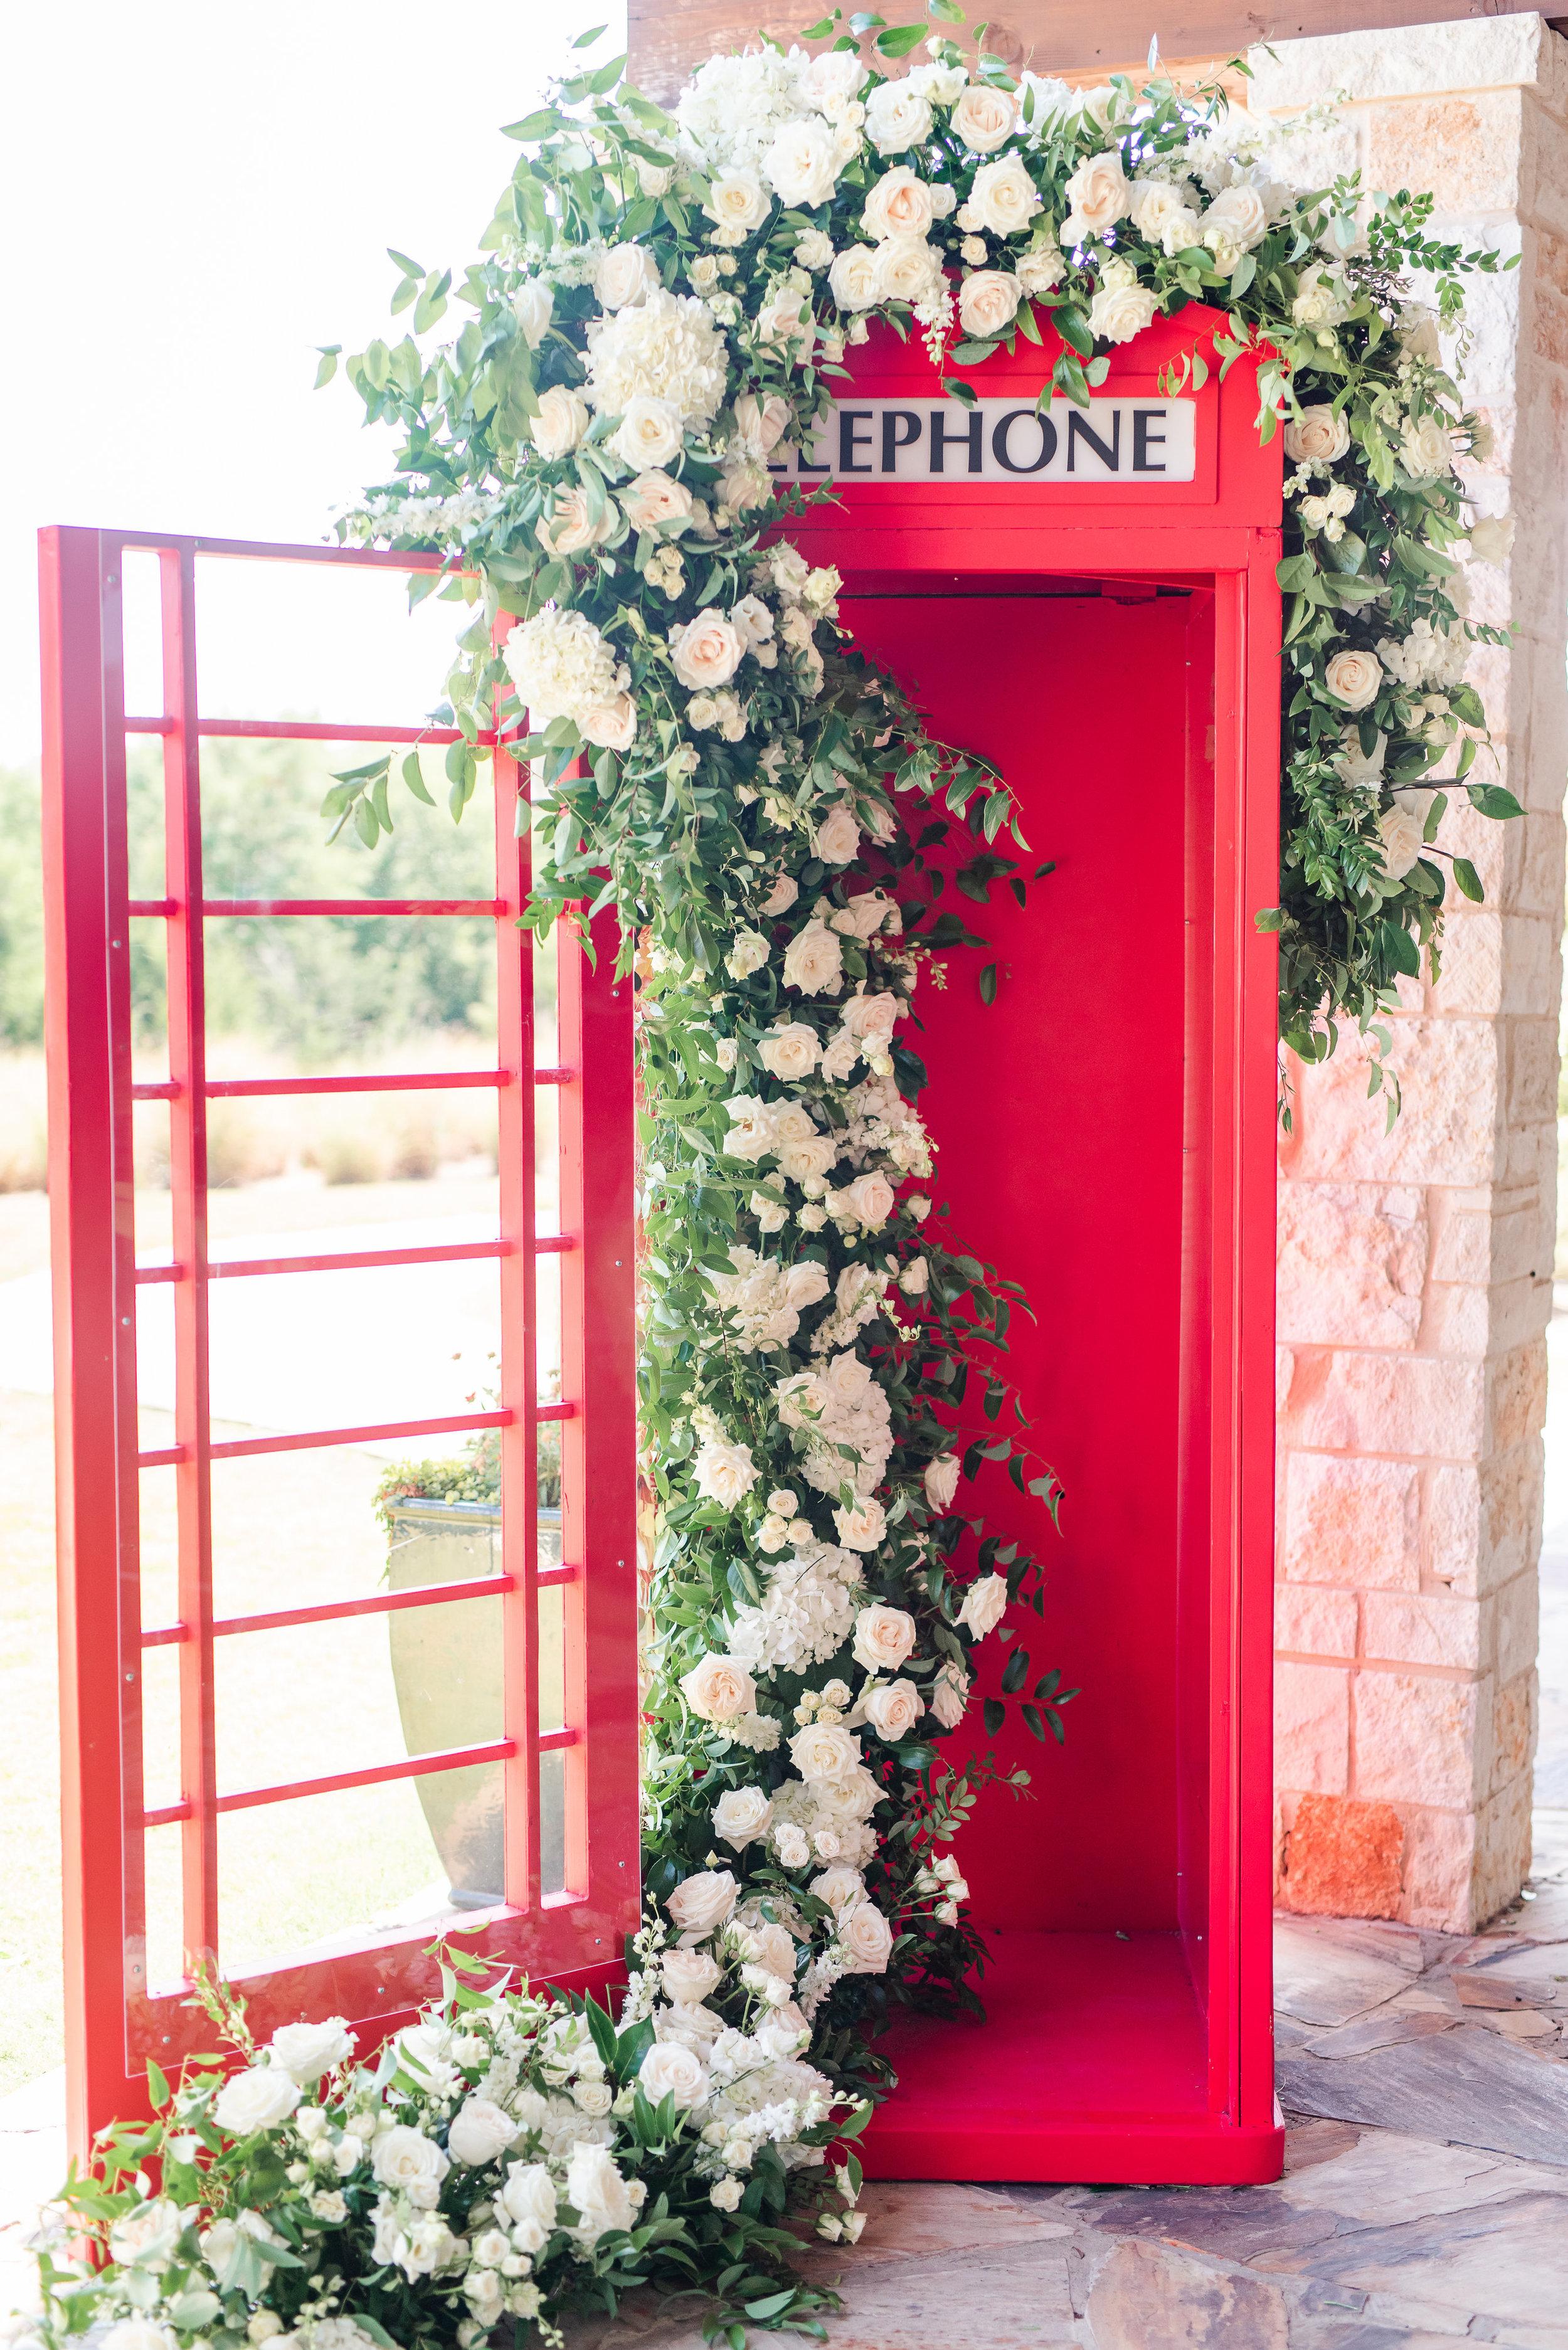 London Phone Booth wedding photobooth